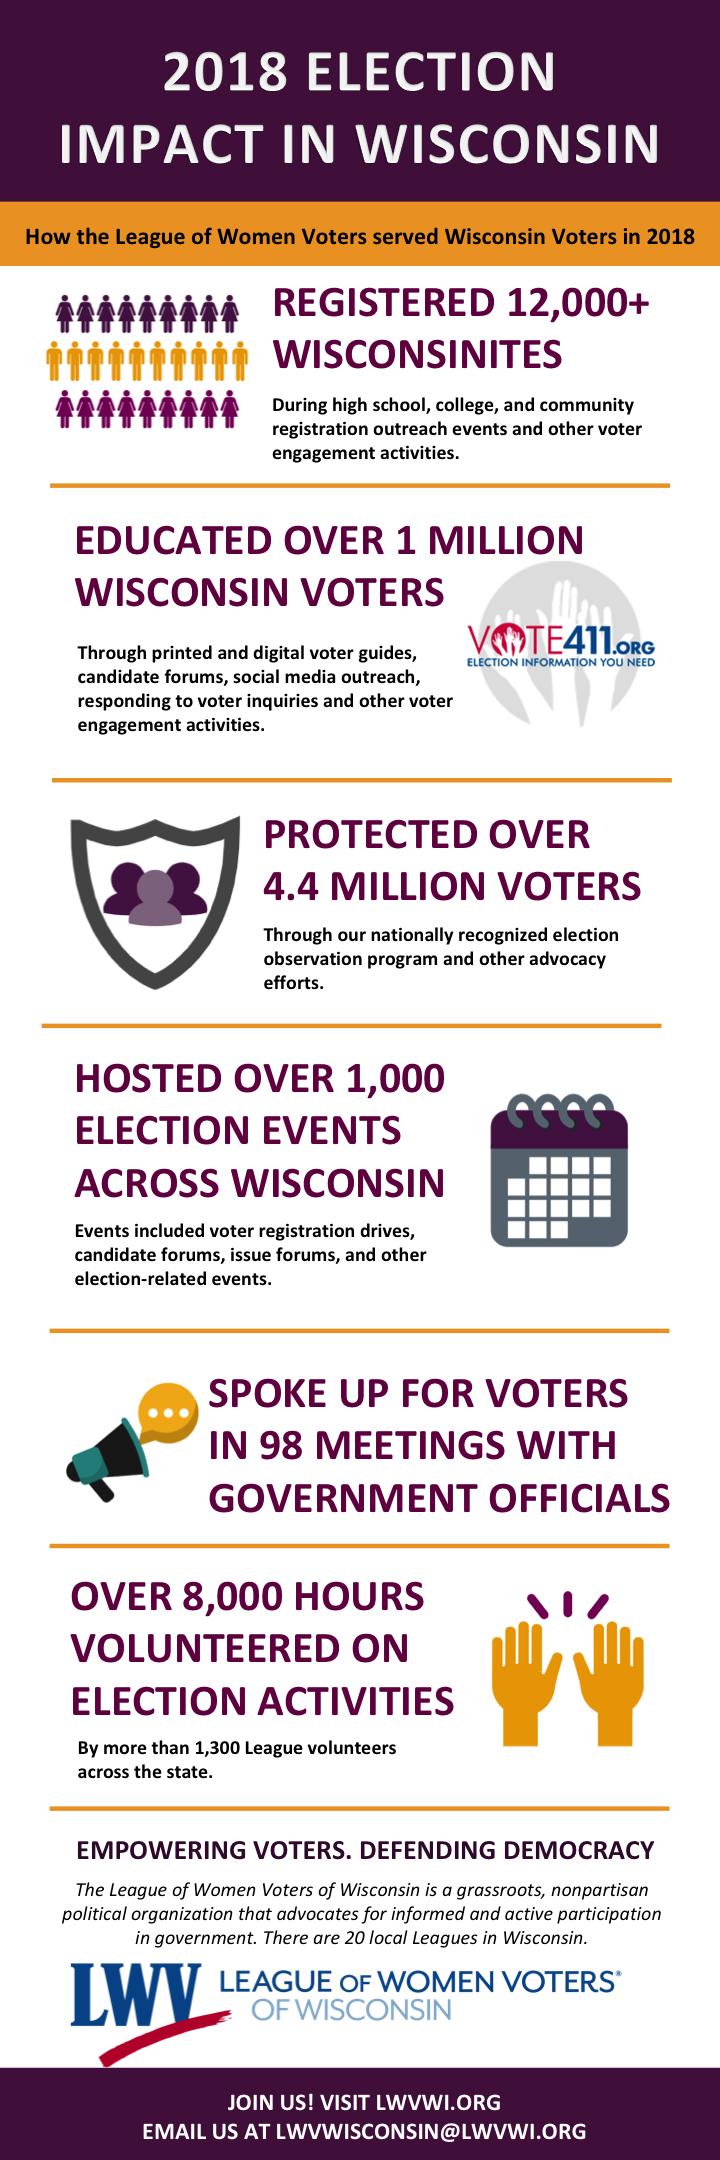 2018 Election Impact